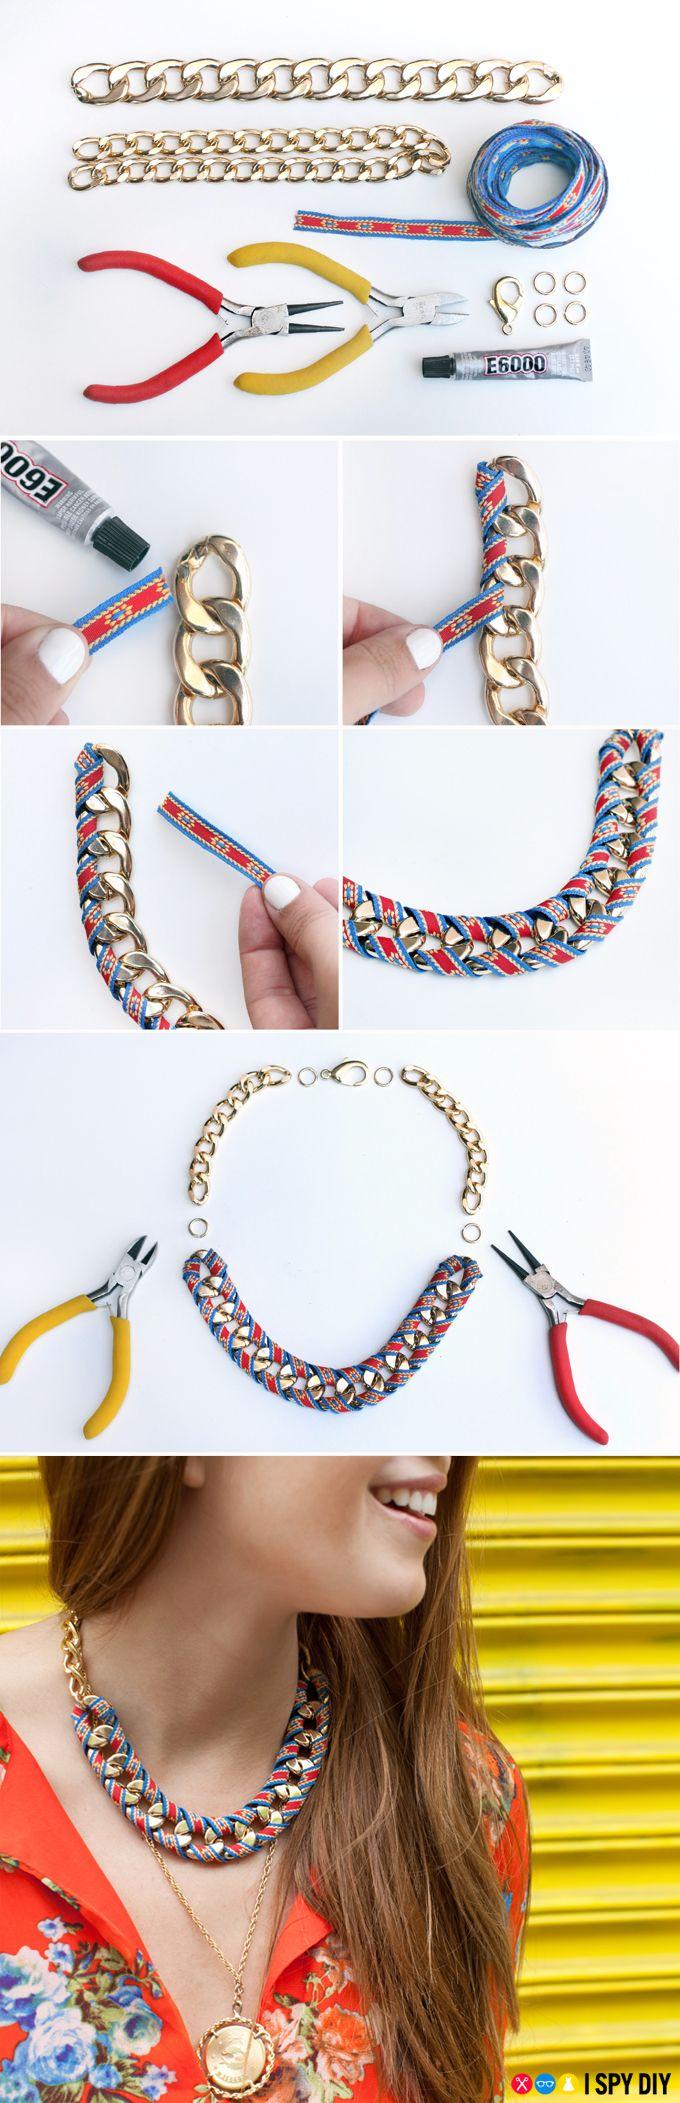 diy jewelry 19